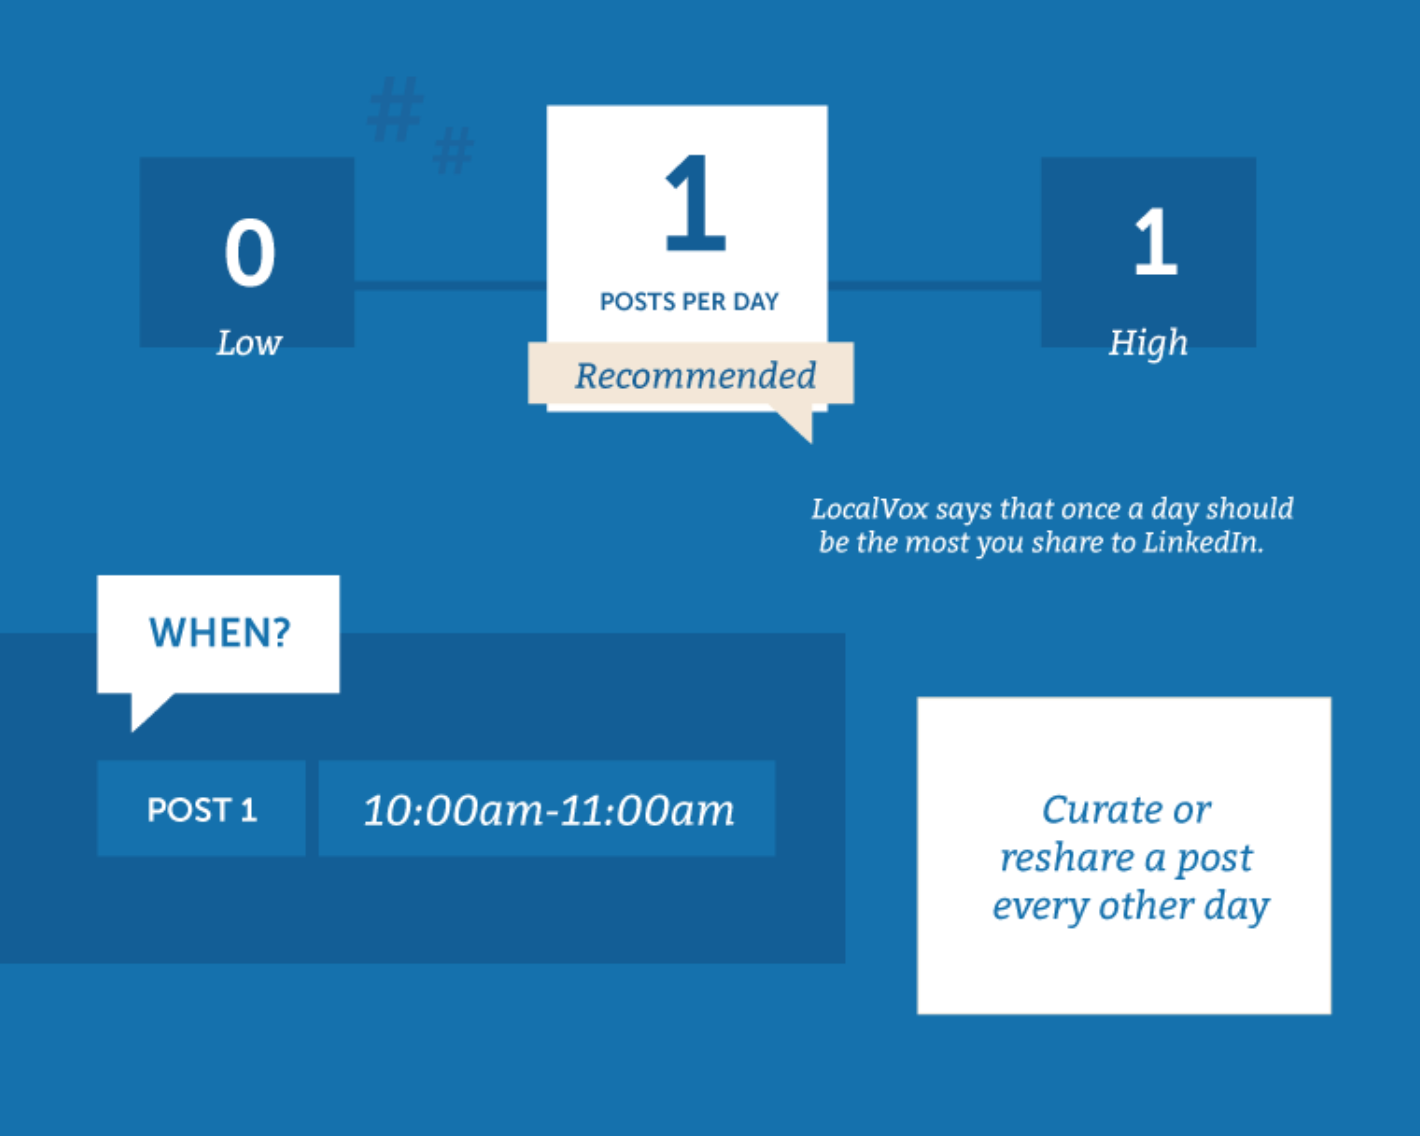 average LinkdIn posts per day influencer